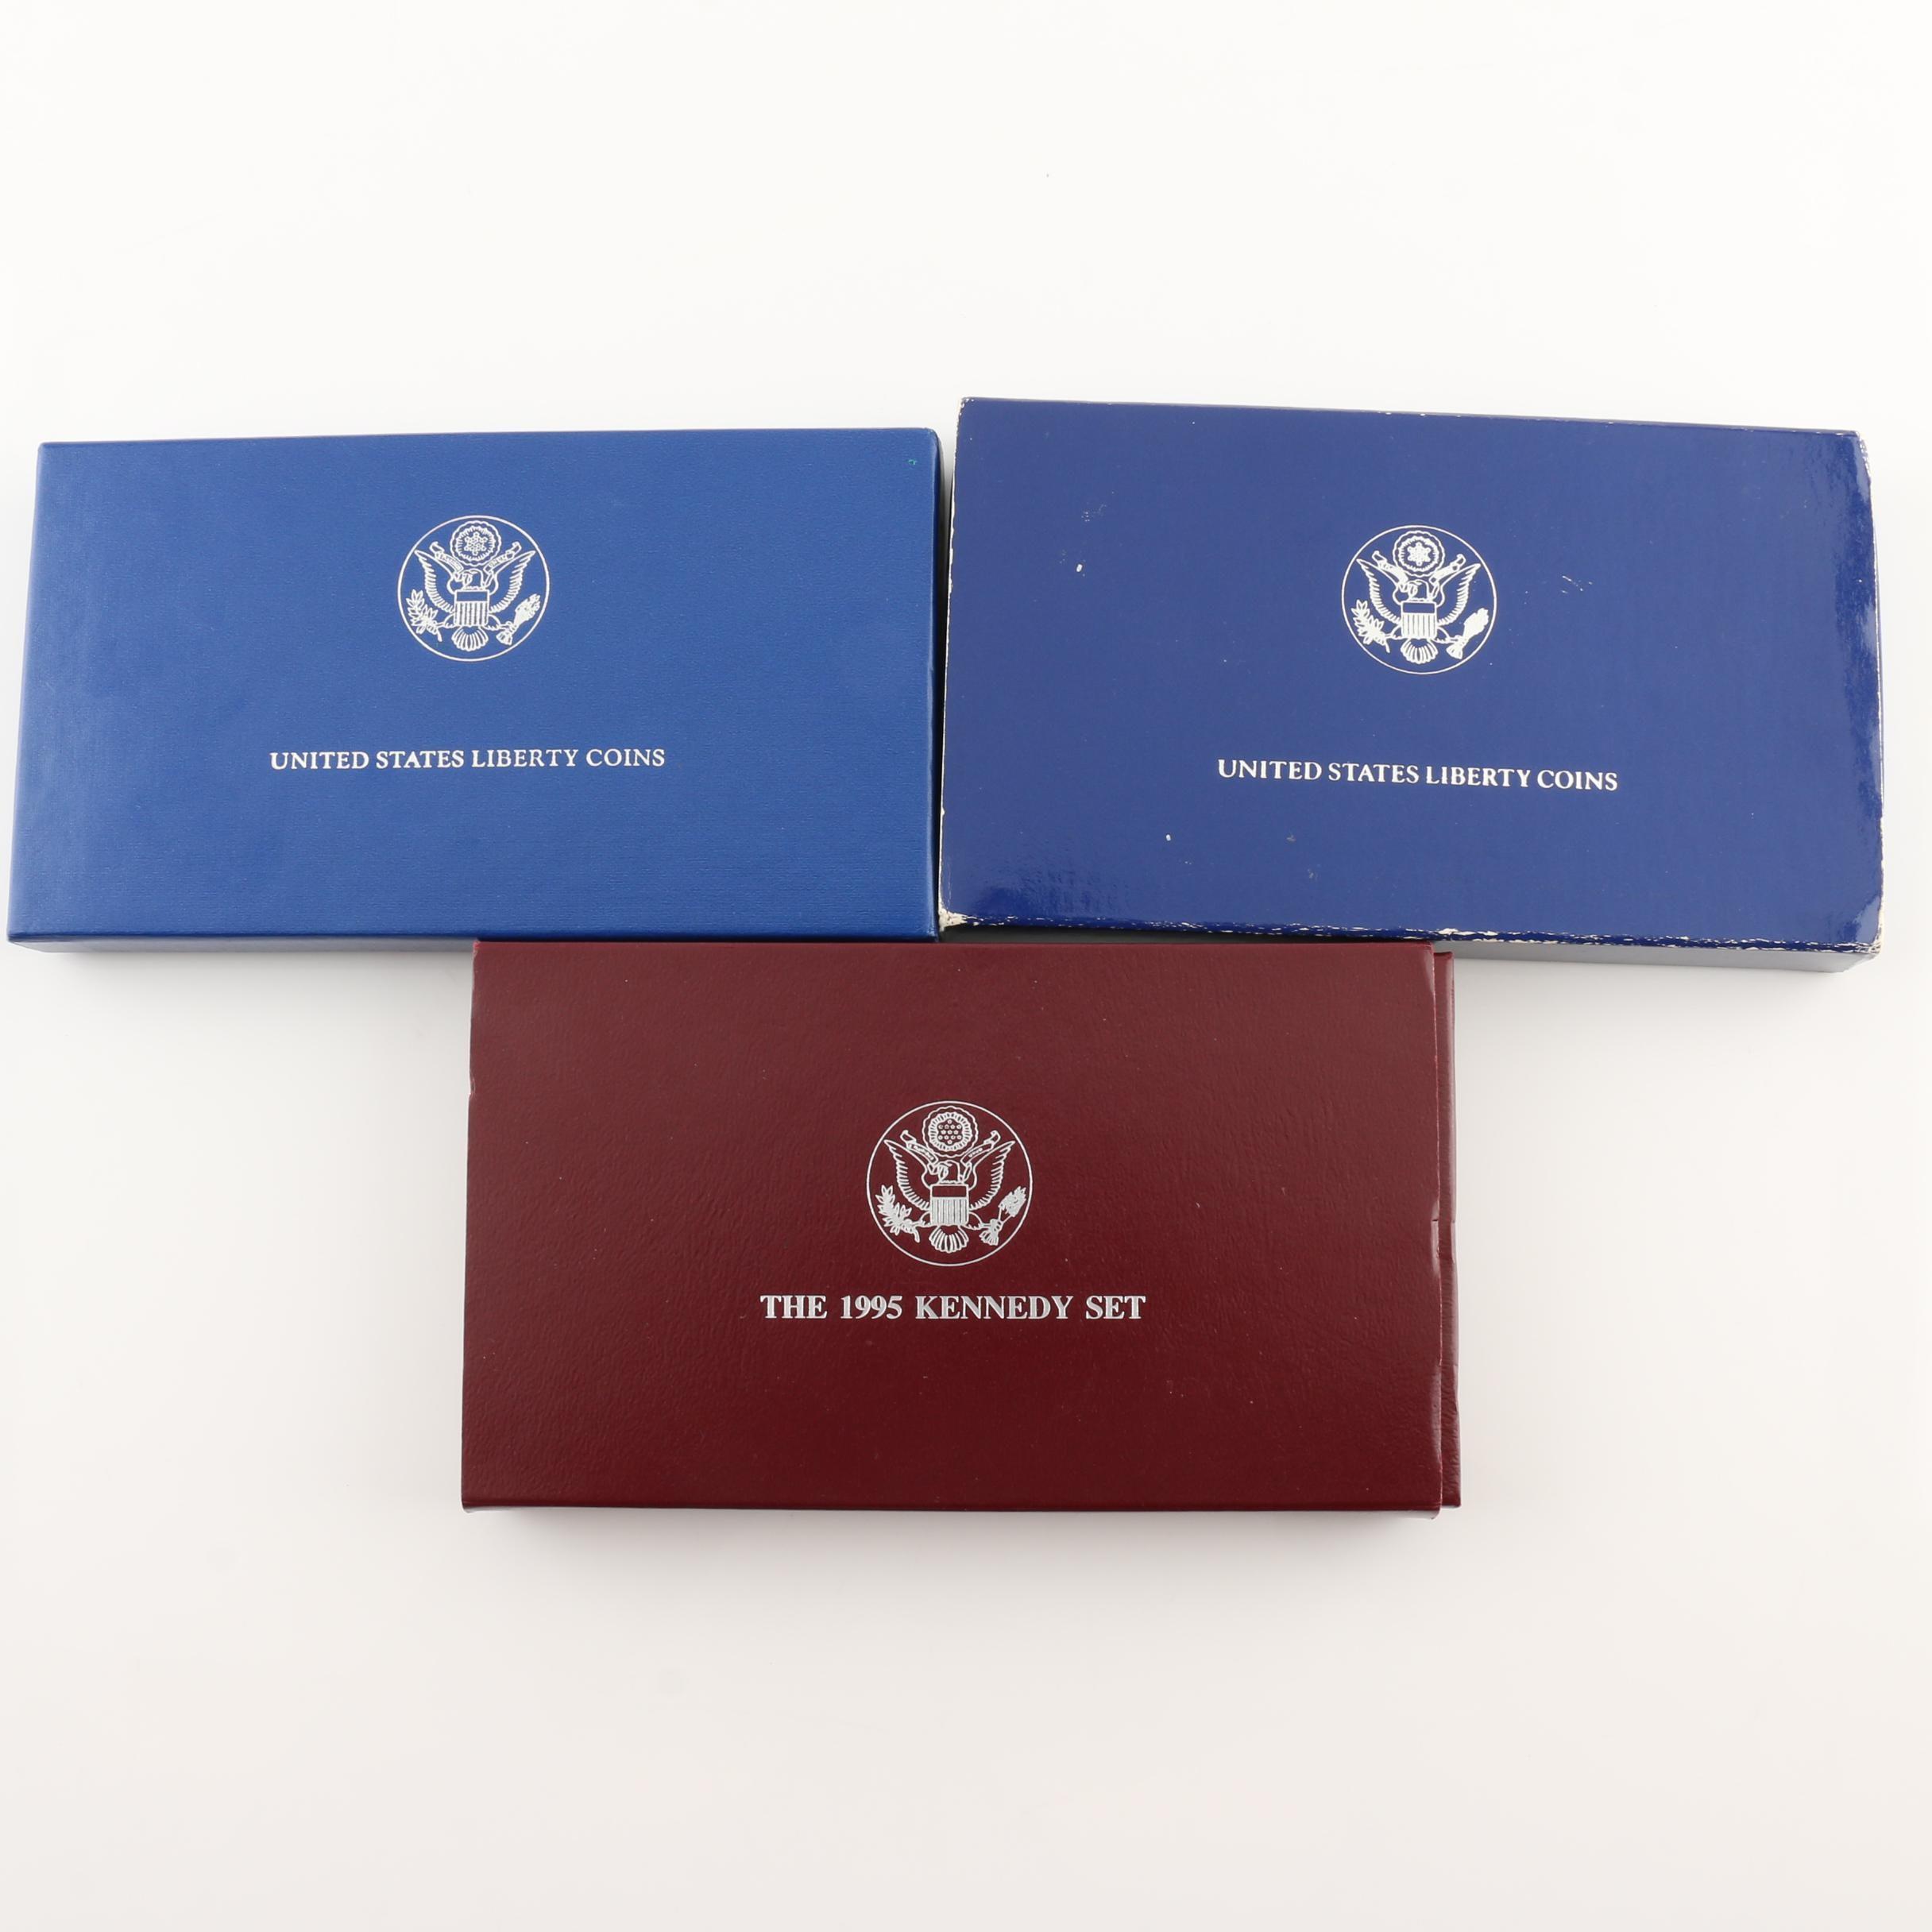 Three U.S. Mint Sets of Commemorative Silver Dollars and Half Dollars